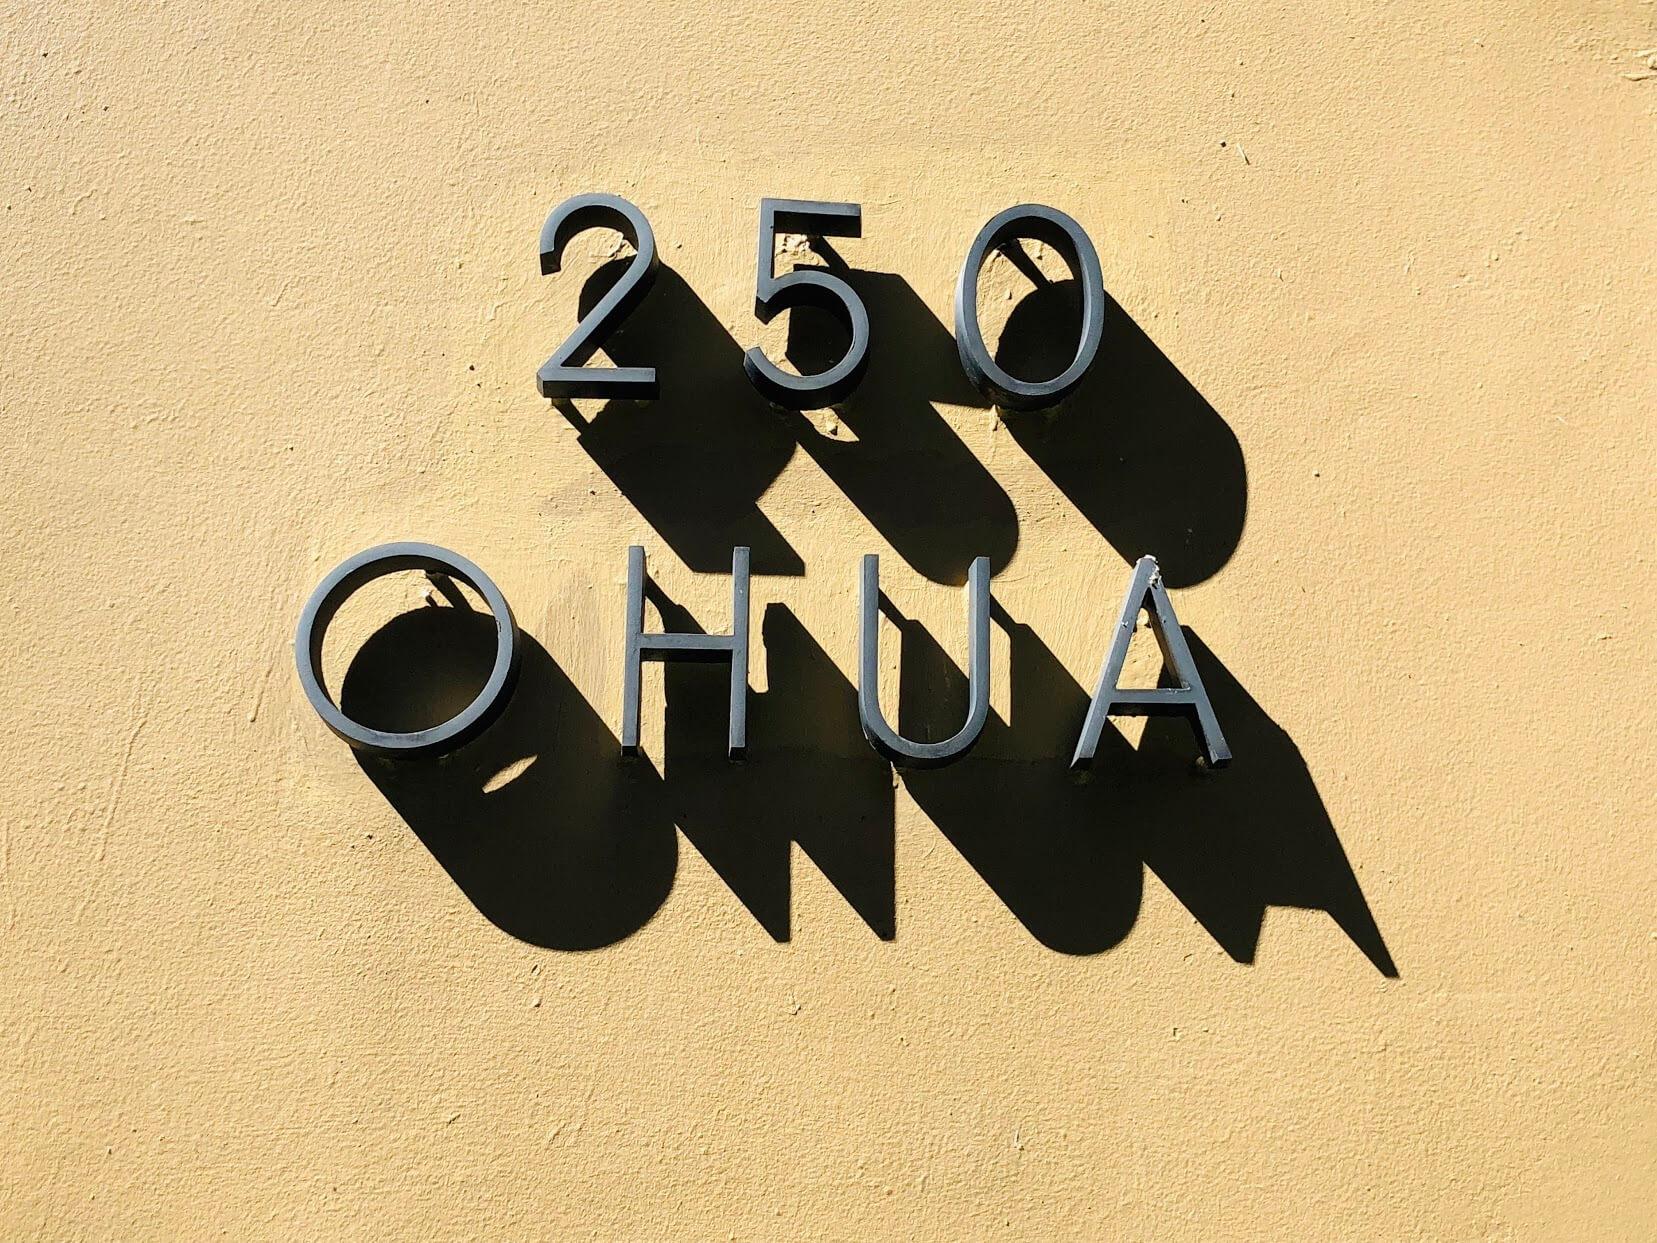 250 Ohuaの看板